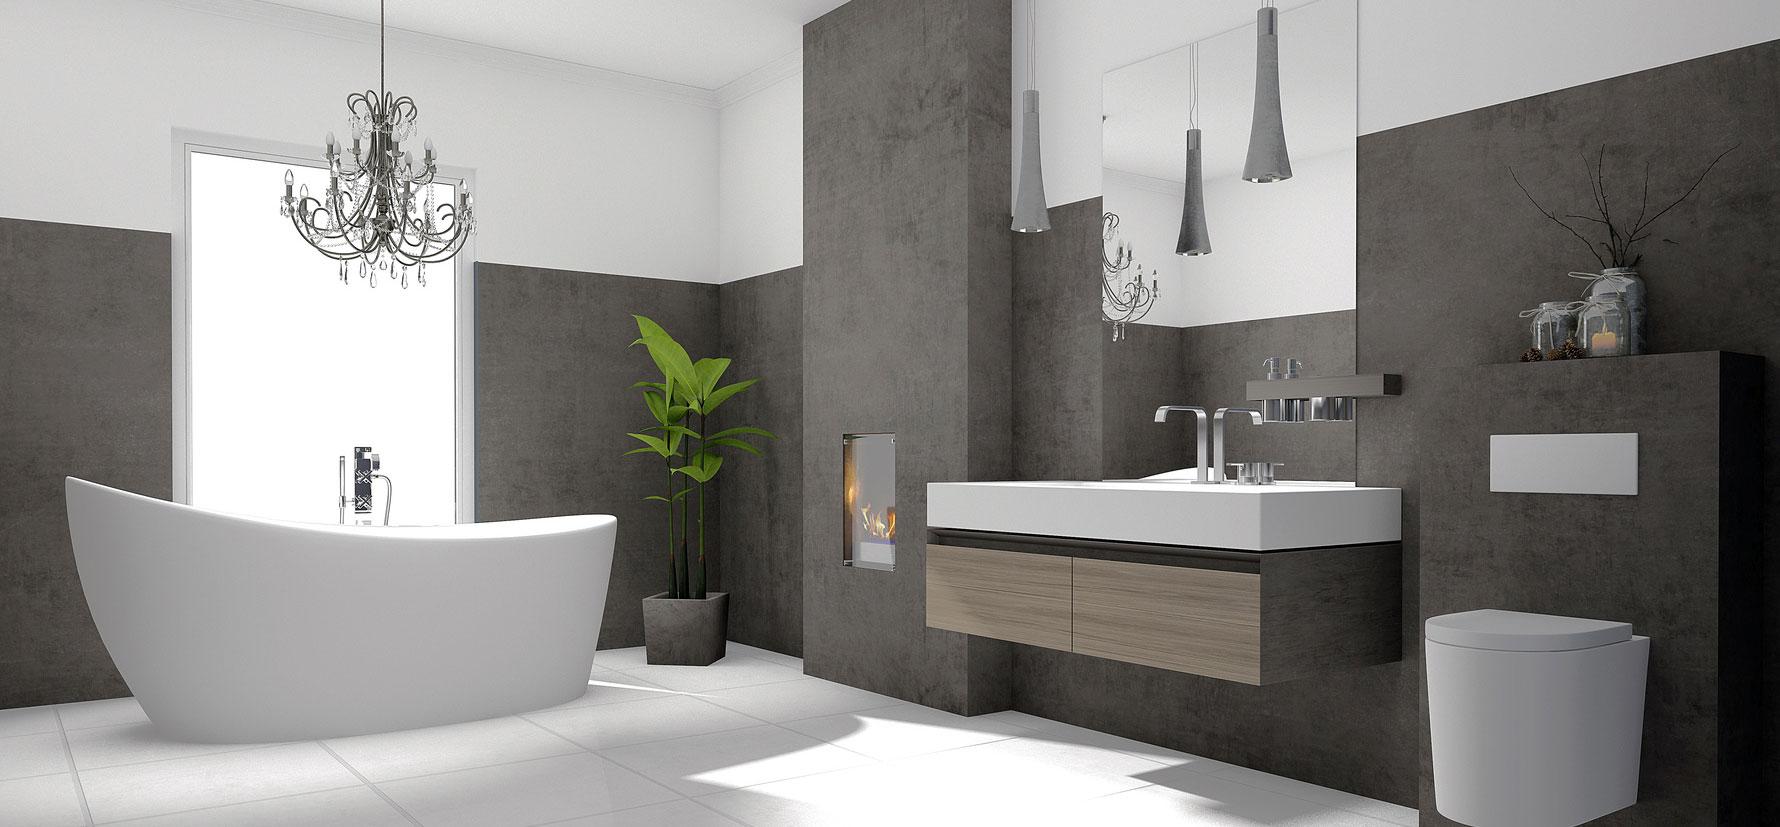 s tec sanierungs technik freiburg fassadensanierung. Black Bedroom Furniture Sets. Home Design Ideas